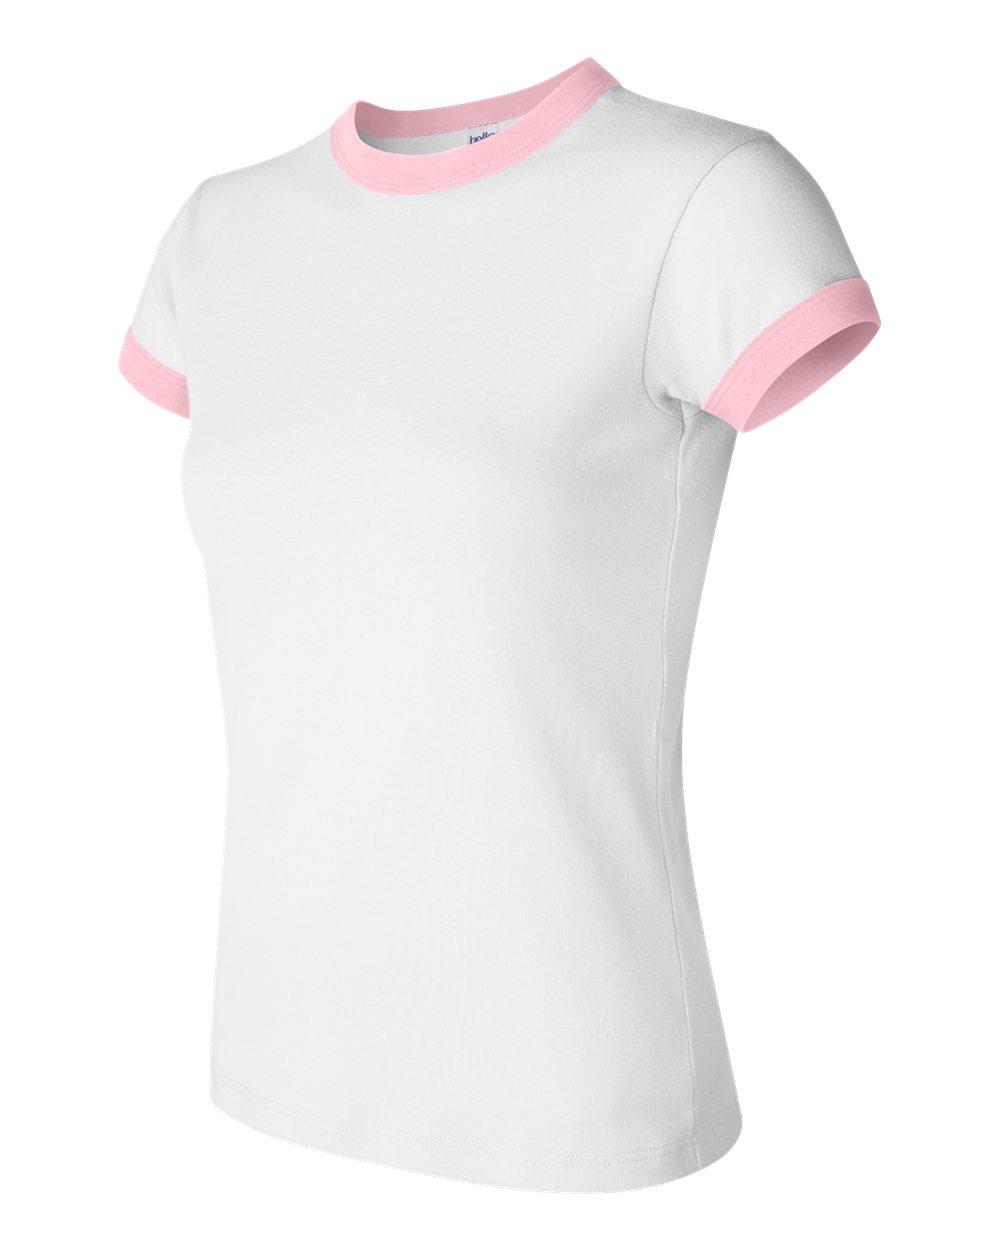 Bella 1007 White - Pink